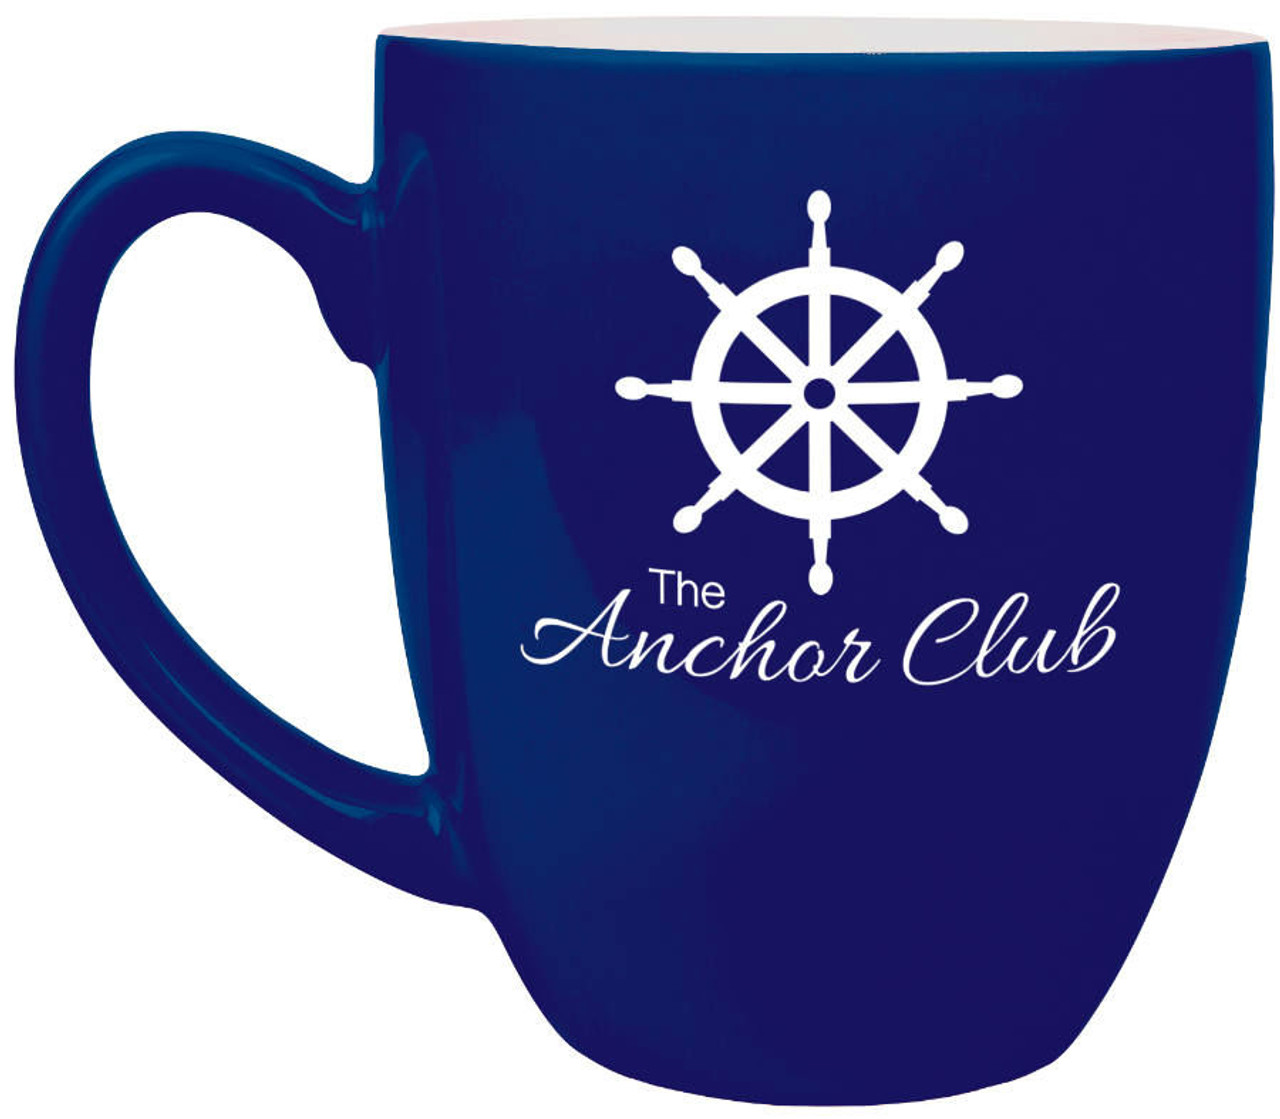 Mug Coffee Style Bistro Style Bistro Blue Blue Coffee Mug bg6yYvf7mI